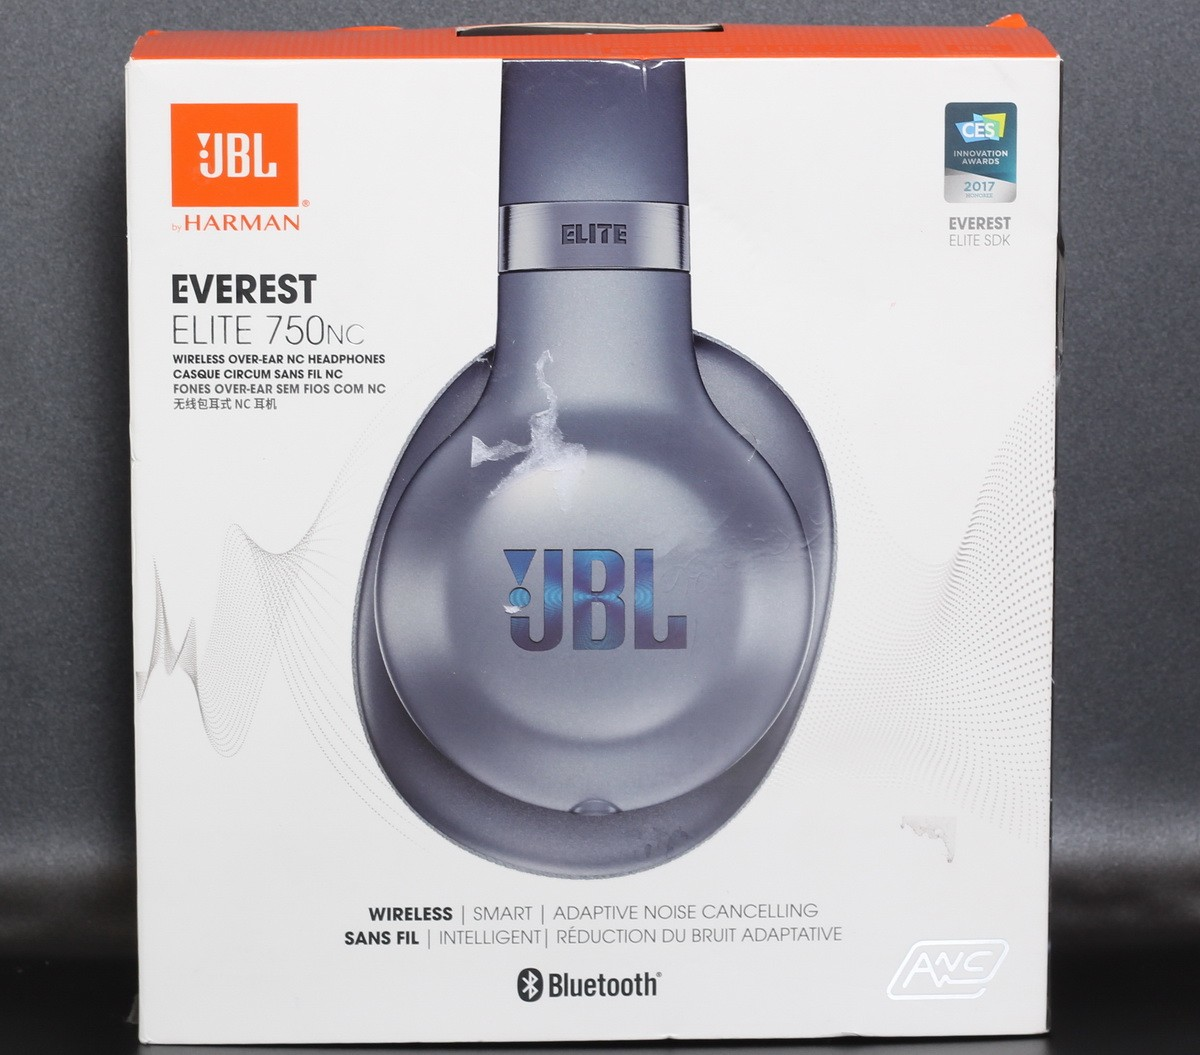 37219f83a69 Details about JBL Everest Elite 750nc Wireless Bluetooth Noise Cancelling  Headphones Blue M#5